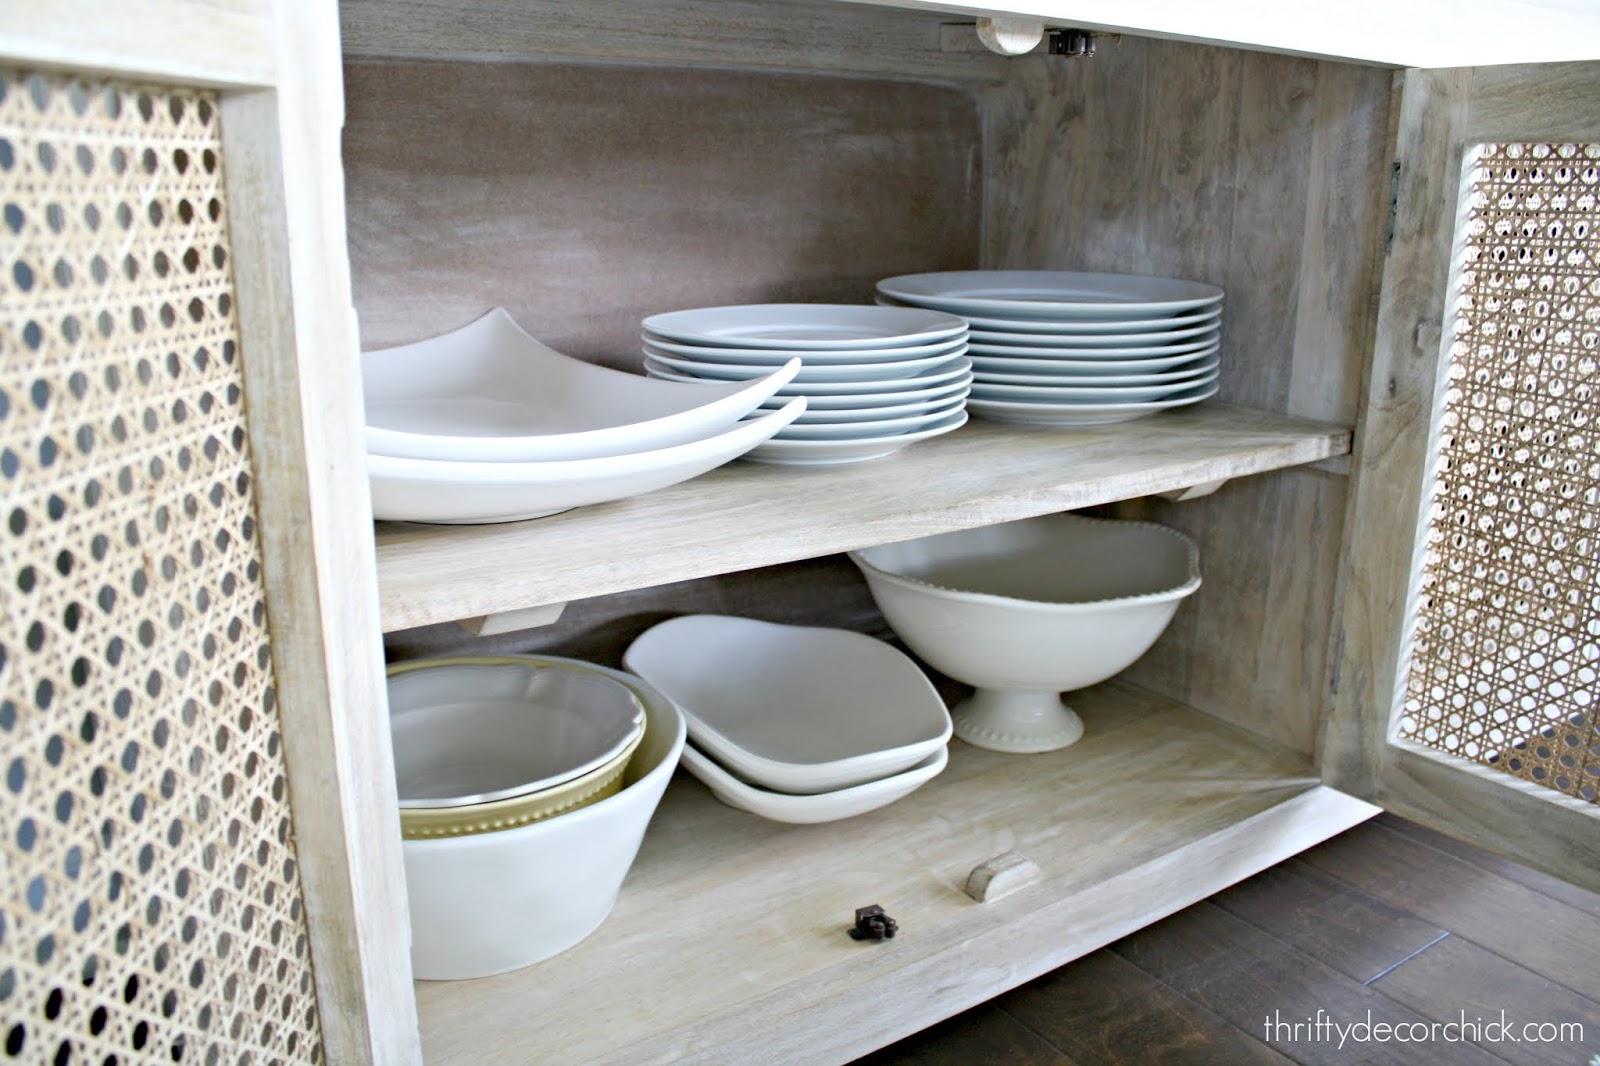 Decorative console storage in dining area